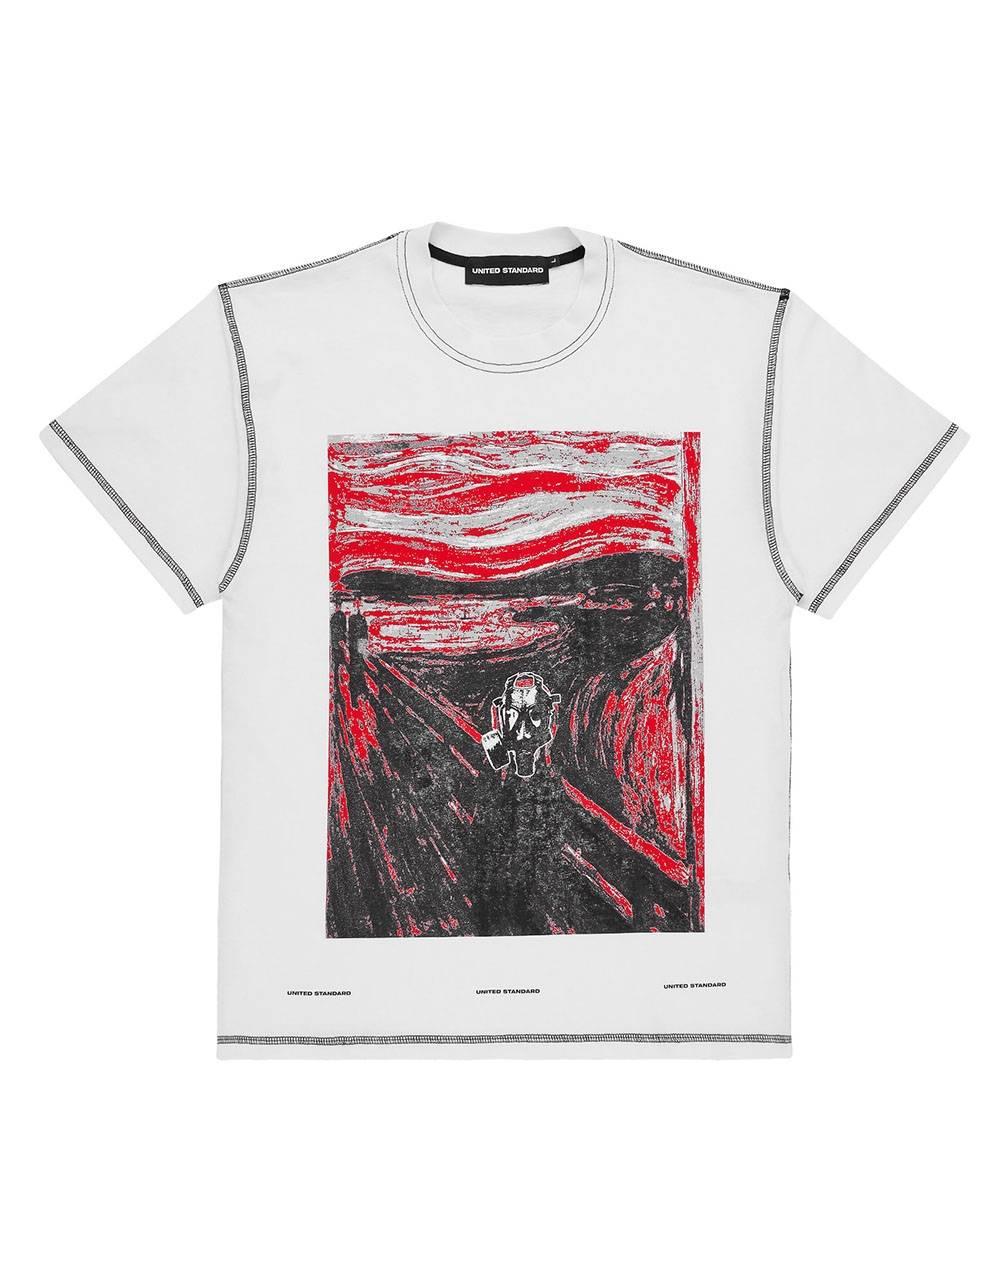 United Standard Vincent tee - white United Standard T-shirt 72,95€